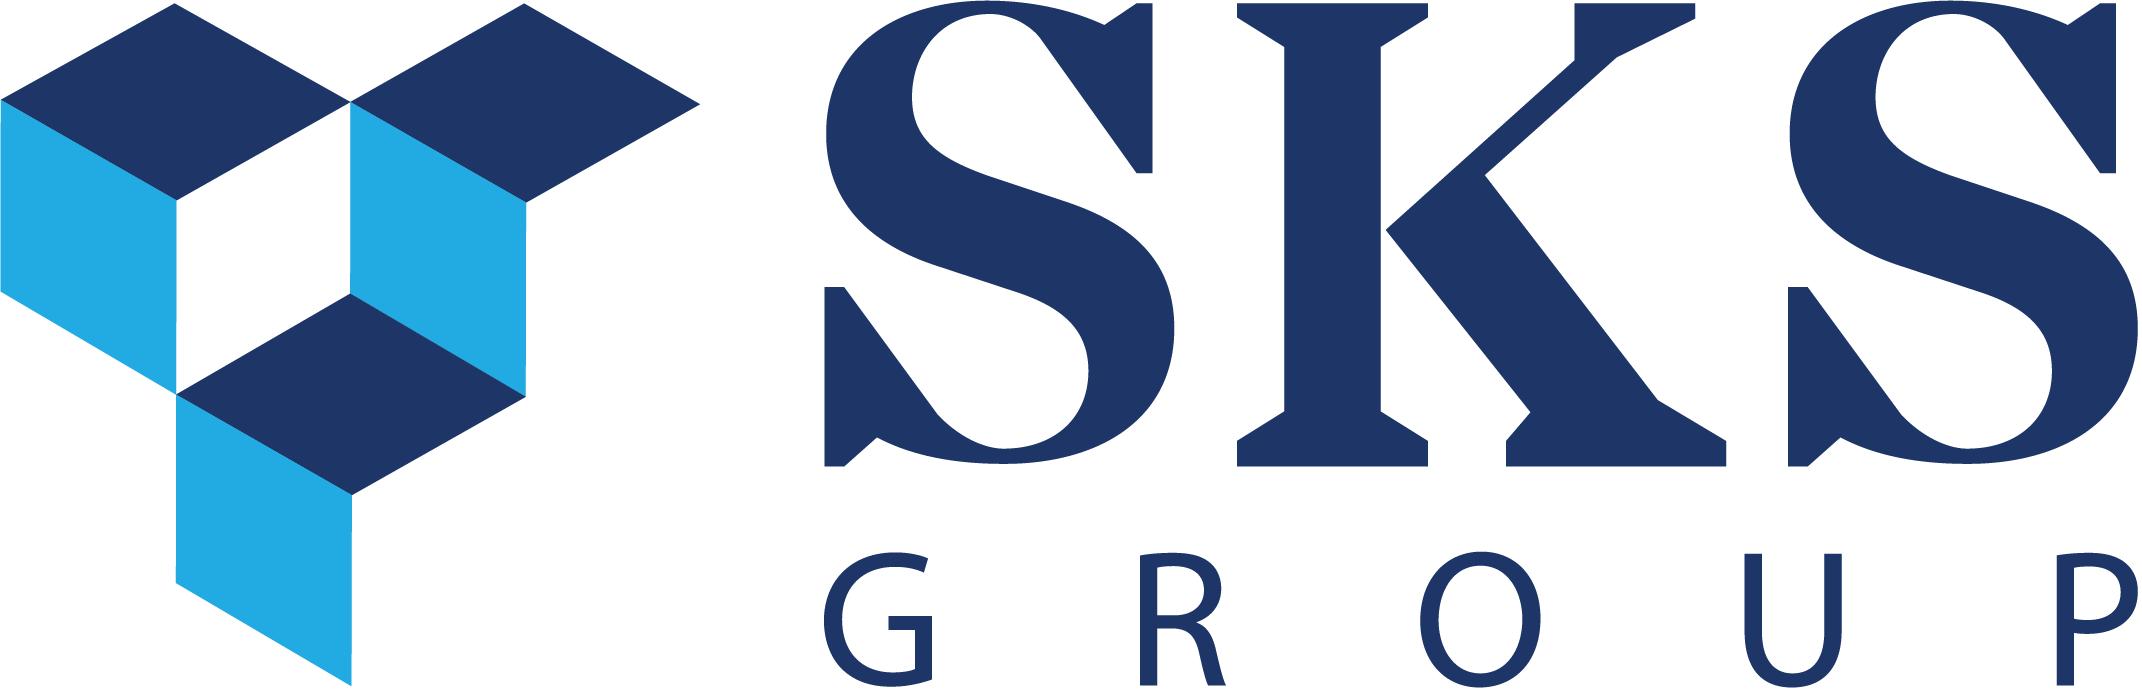 SKS-Group-MY-AU-RGB-on-white